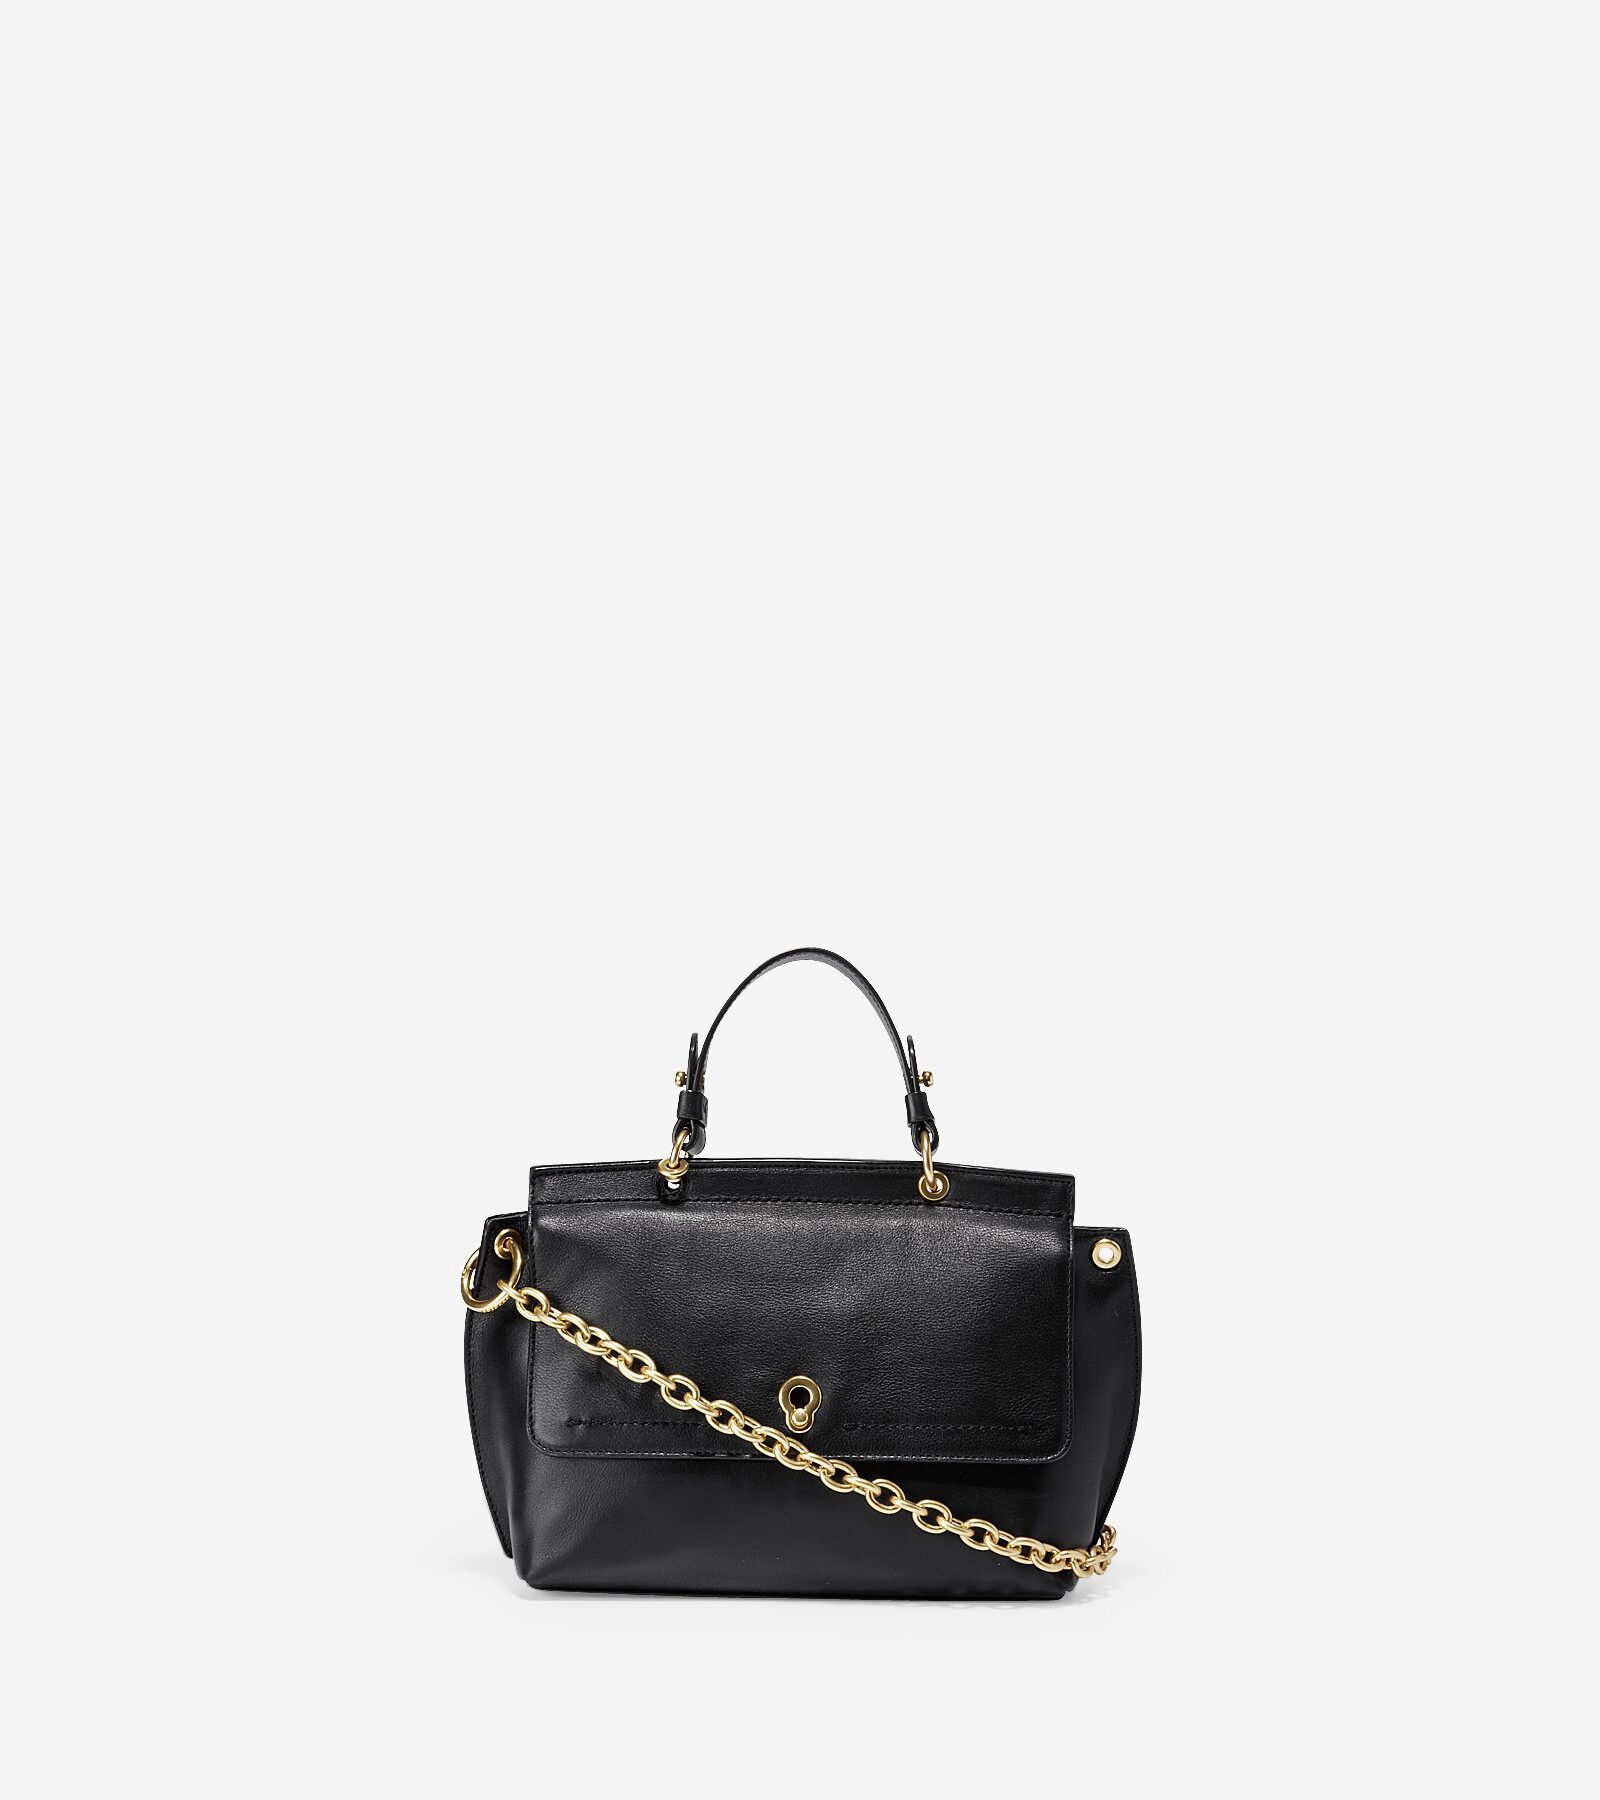 Cole Haan Zoe Work Tote (Black) Tote Handbags mzdKhPKVi